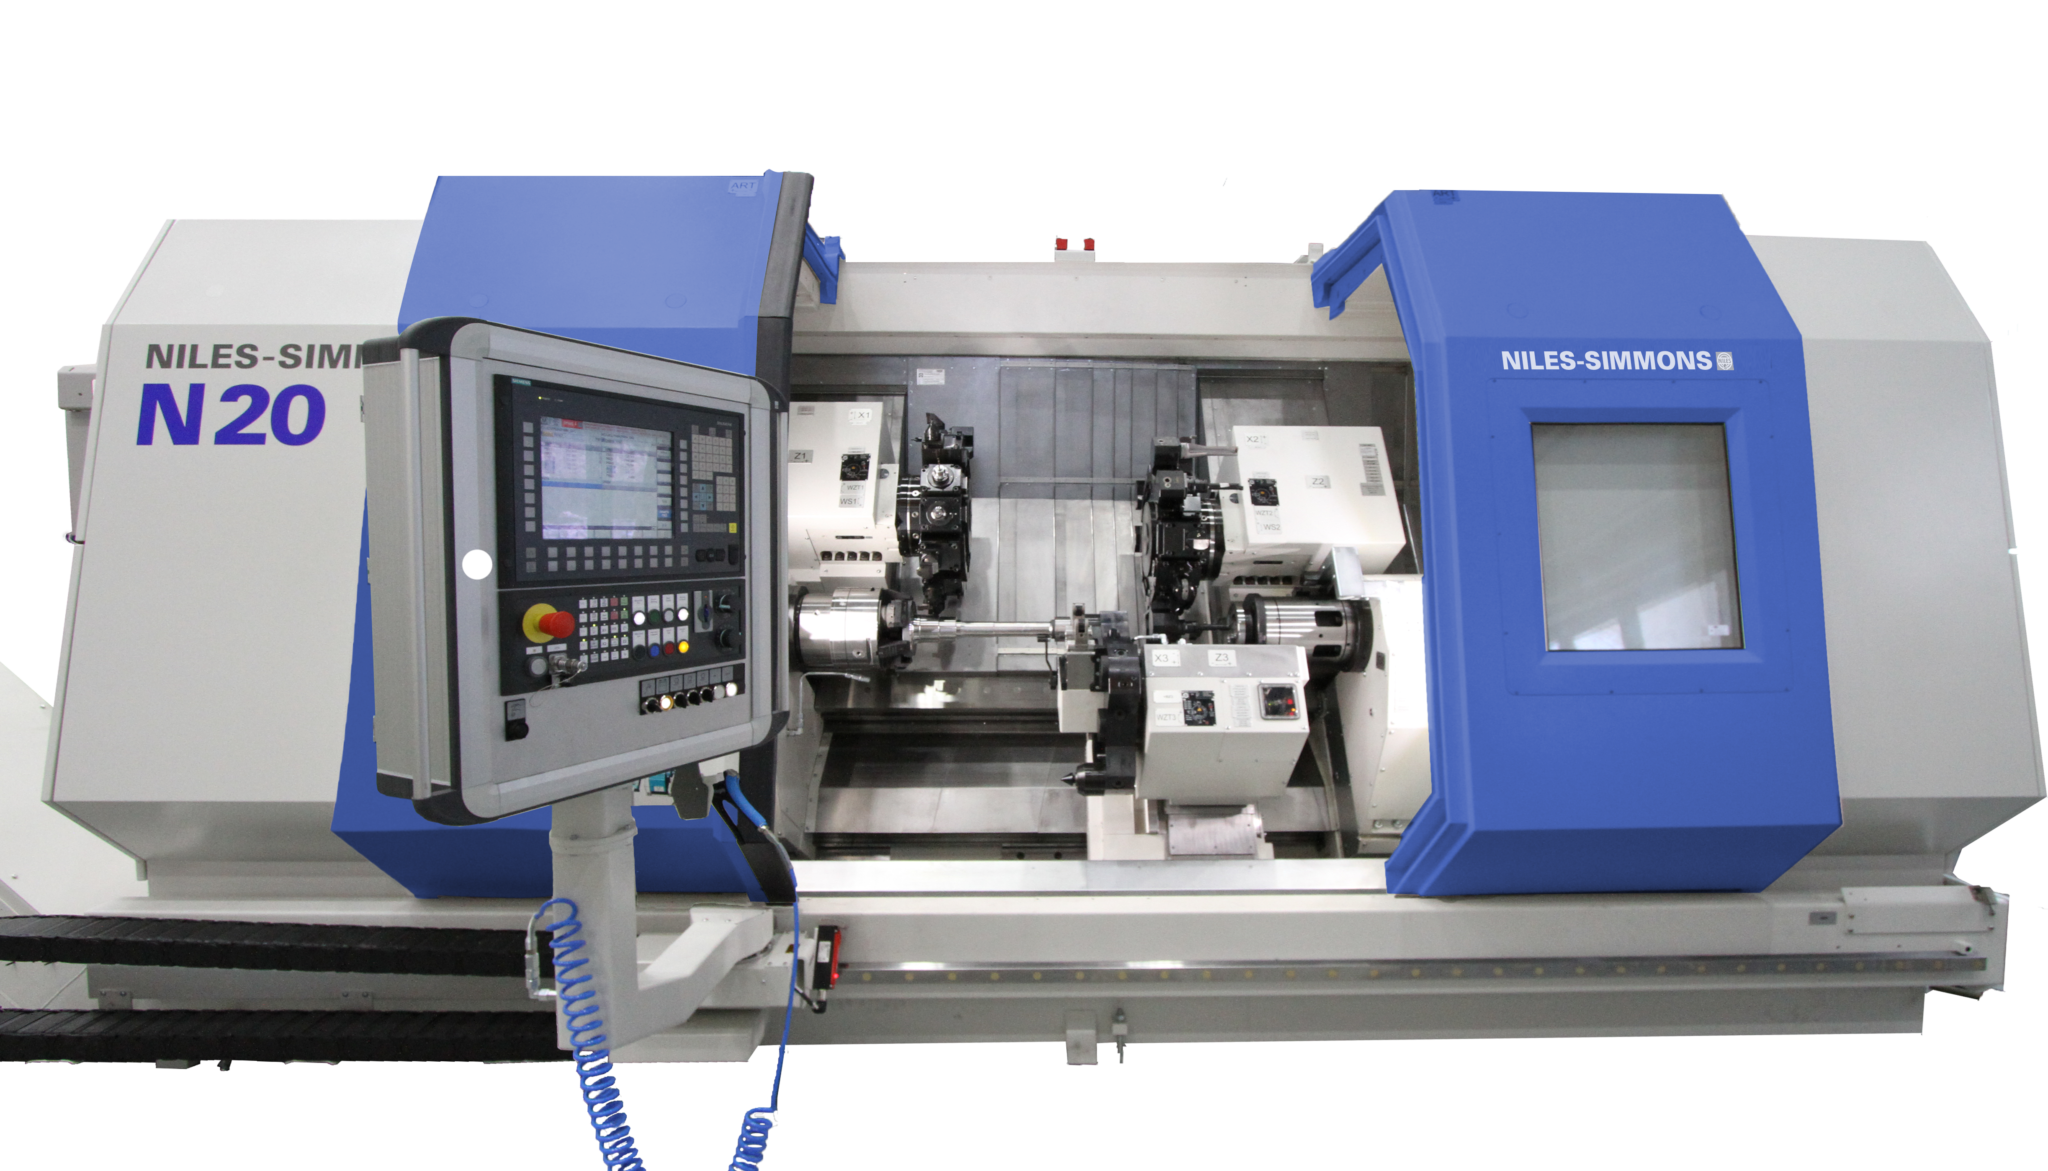 CNC-Drehmaschine N20 / CNC-Lathes N20 / Токарный станок с ЧПУ N20